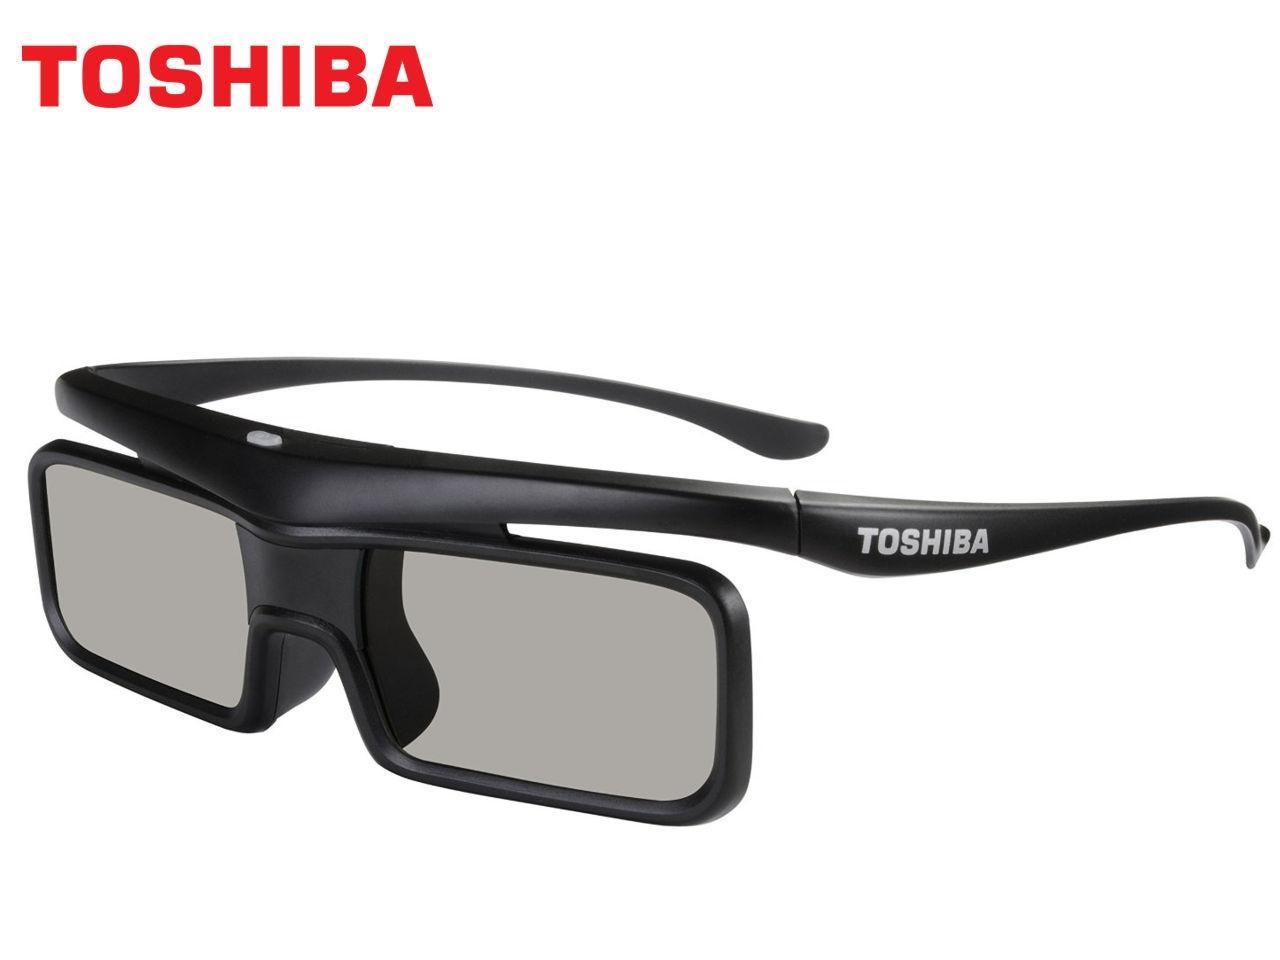 TOSHIBA FPT-AG04G, set 2 ks